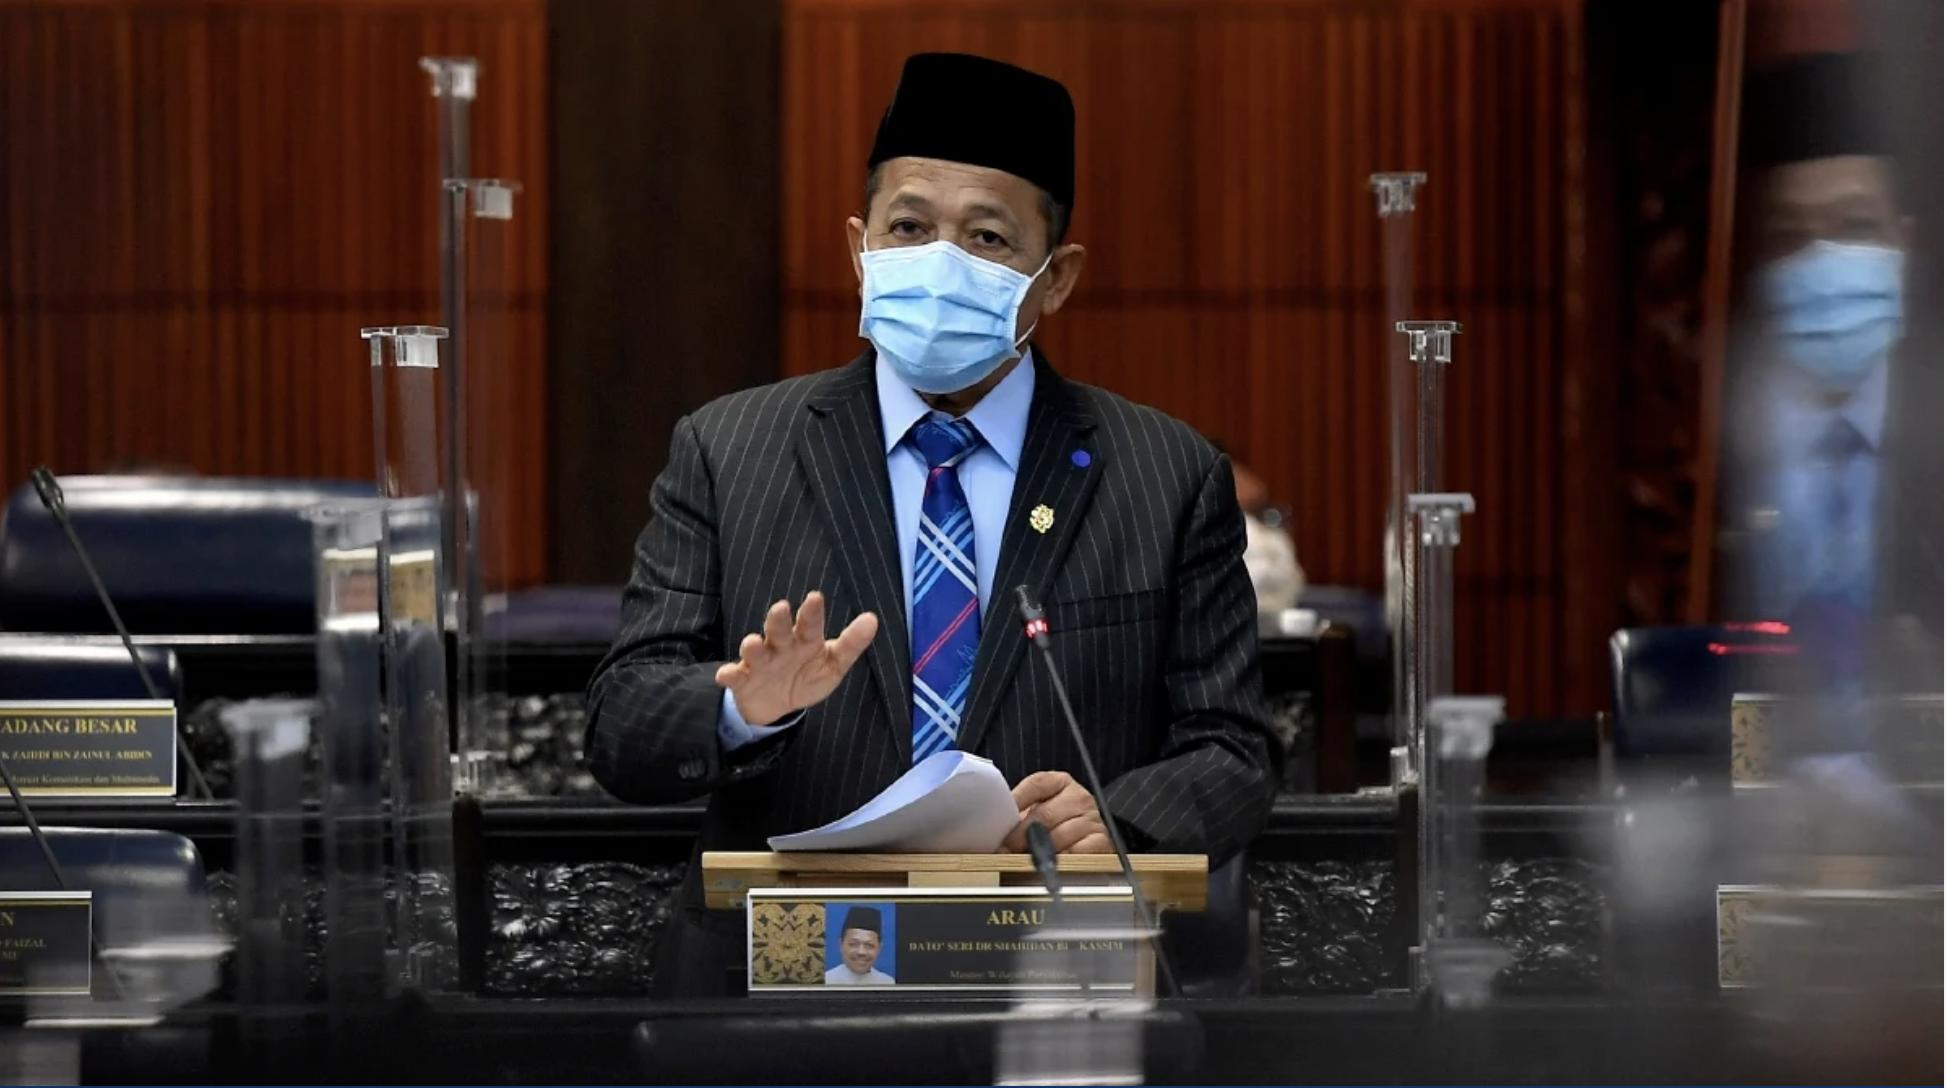 Shahidan in the Parliament